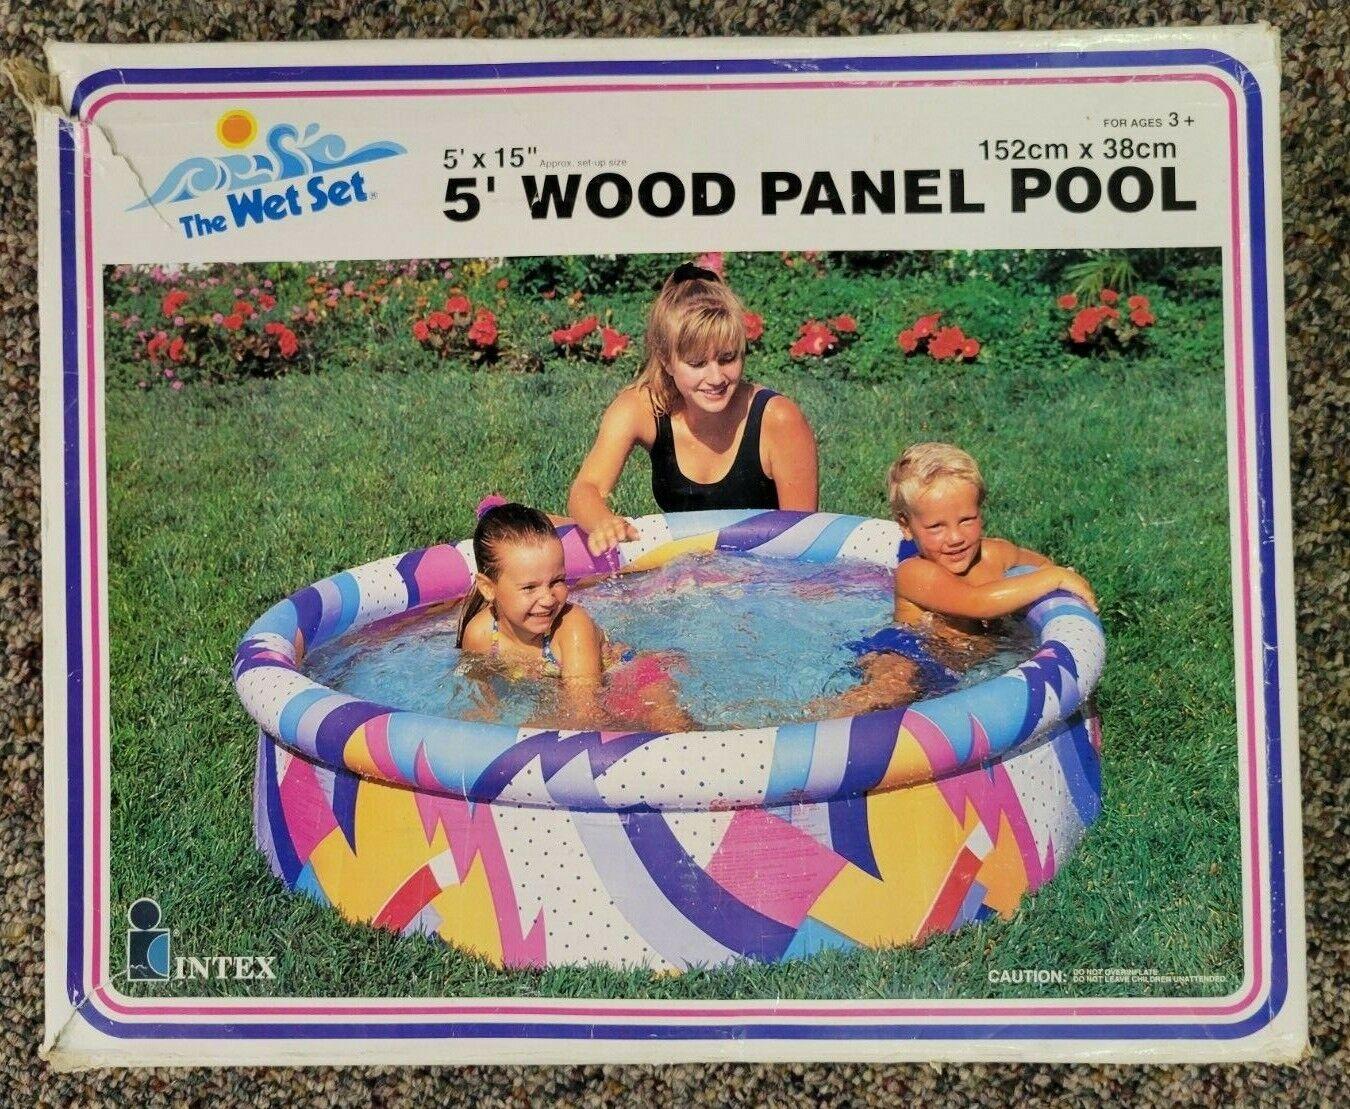 Vintage NIOB 90s Intex Wet Set Inflatable 5' Wood Panel Kiddie Pool 1992